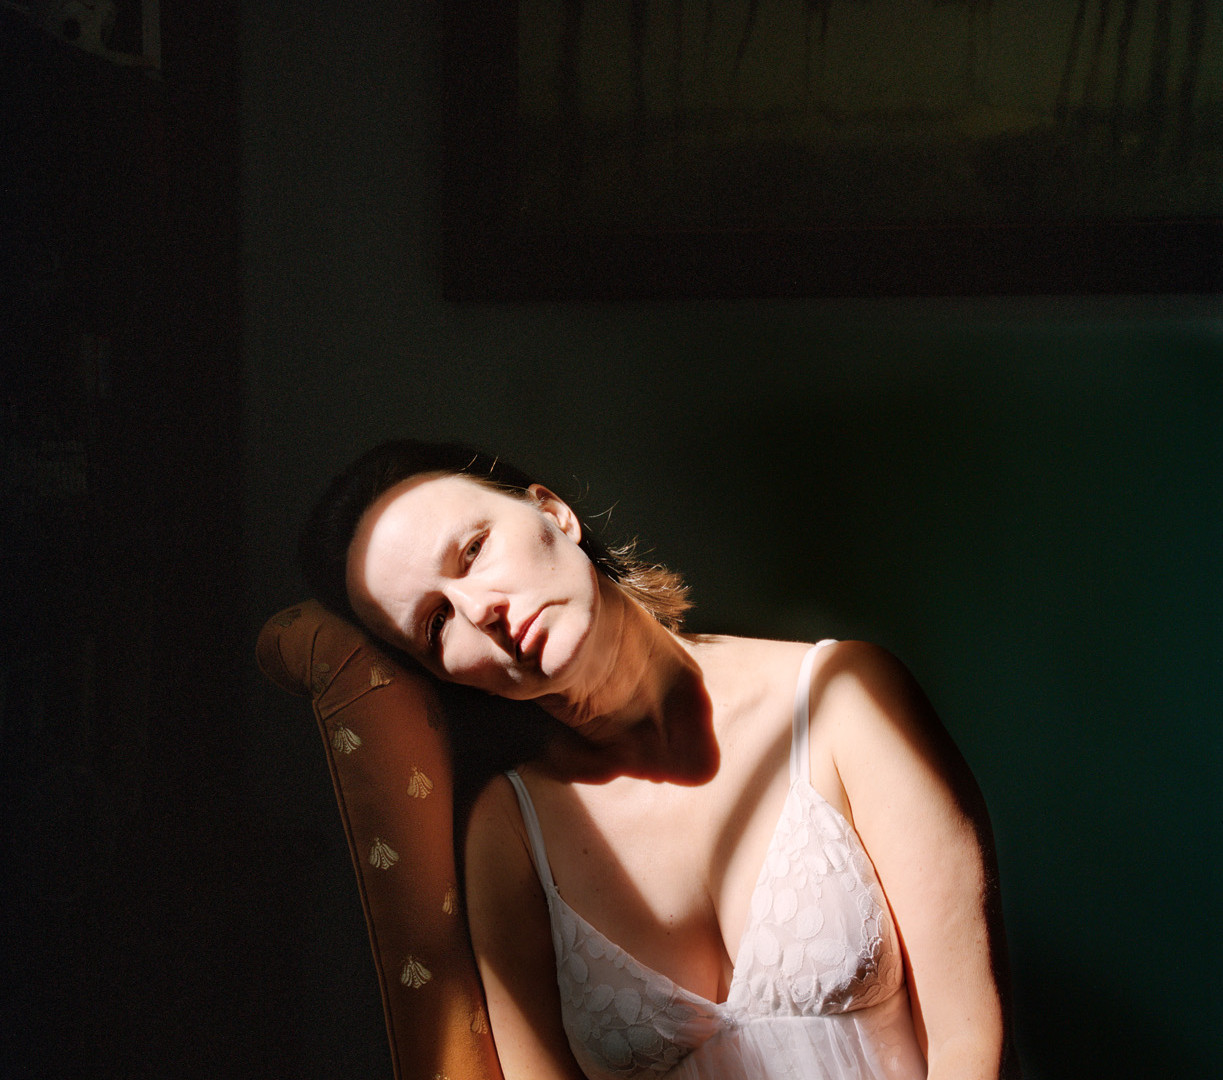 Jocelyn Lee, Untitled (Marguerite in harsh light), 2010